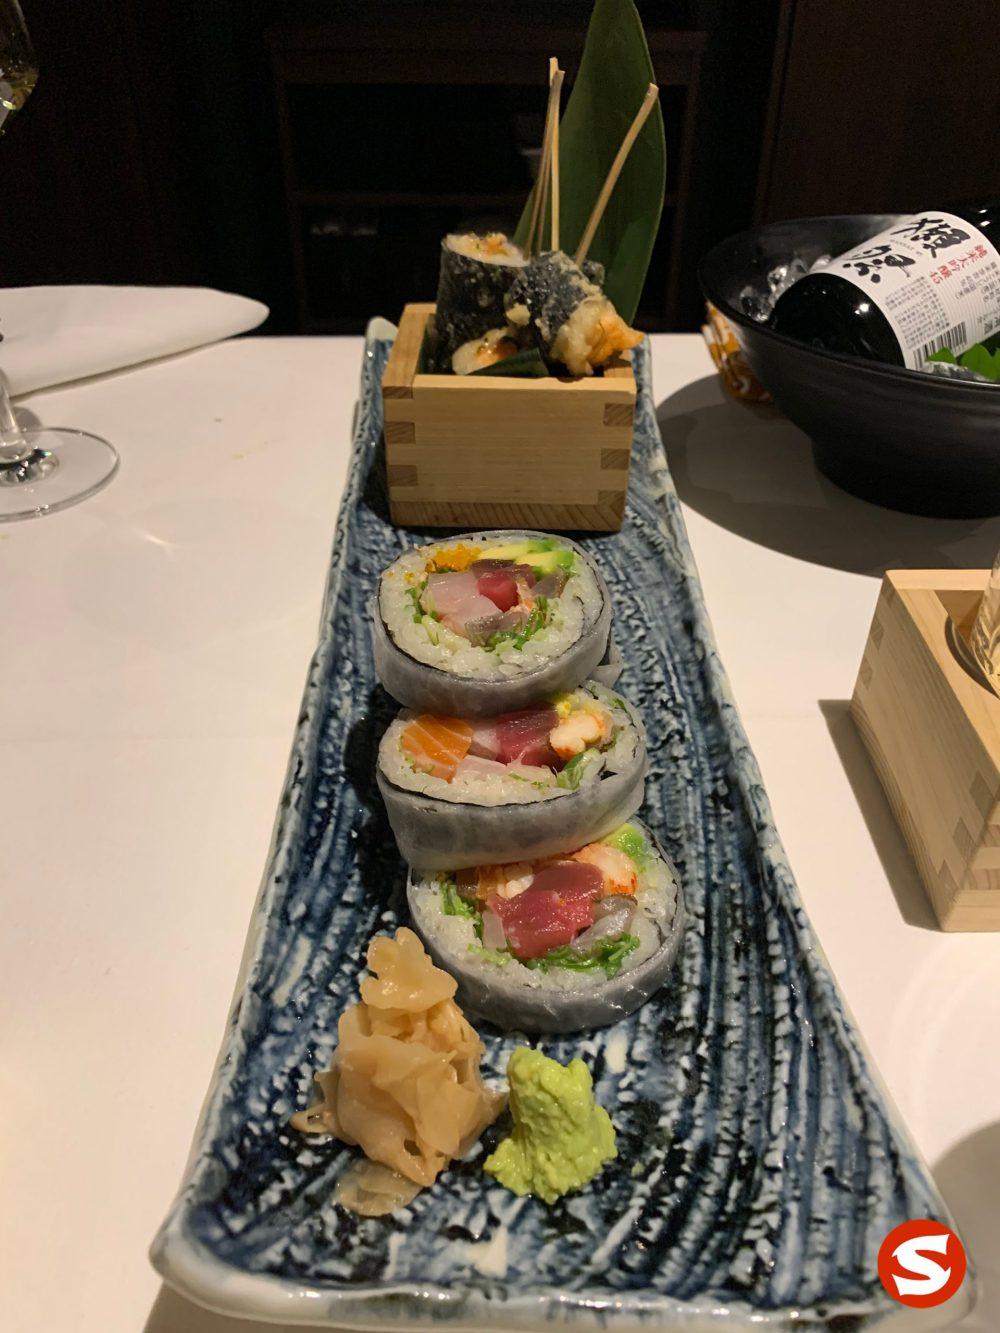 spicy sake (salmon) maki tempura (fried roll) and house roll futomaki (big roll) with maguro (tuna back), sake (salmon), hamachi (yellowtail), ebi (shrimp), kani (crab meat)